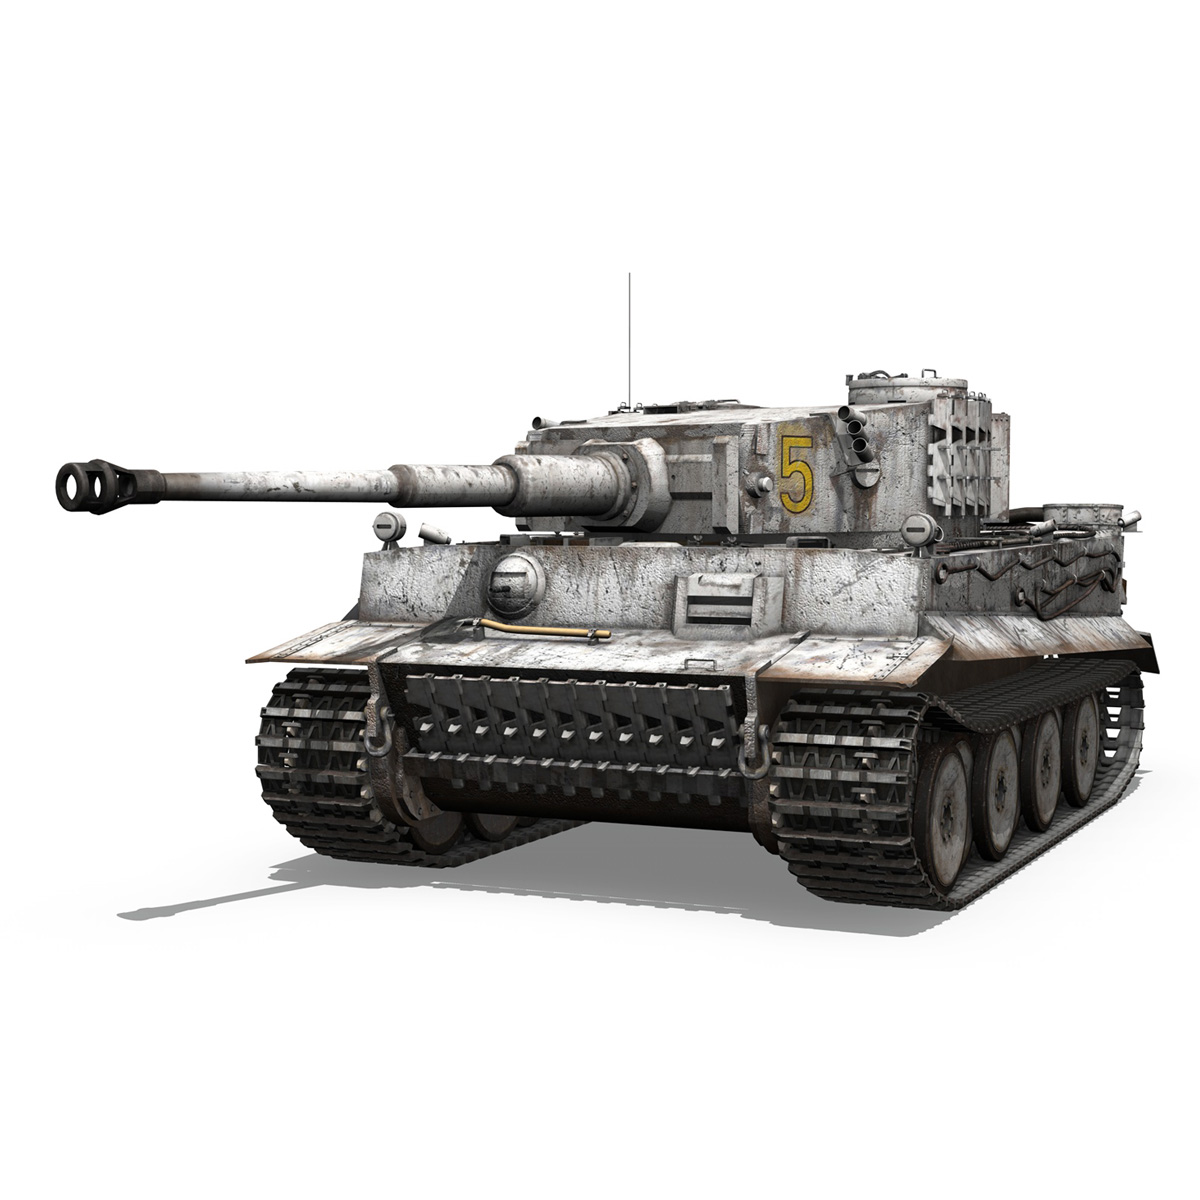 panzer vi – tiger – 5 – early production 3d model 3ds c4d lwo obj 279352